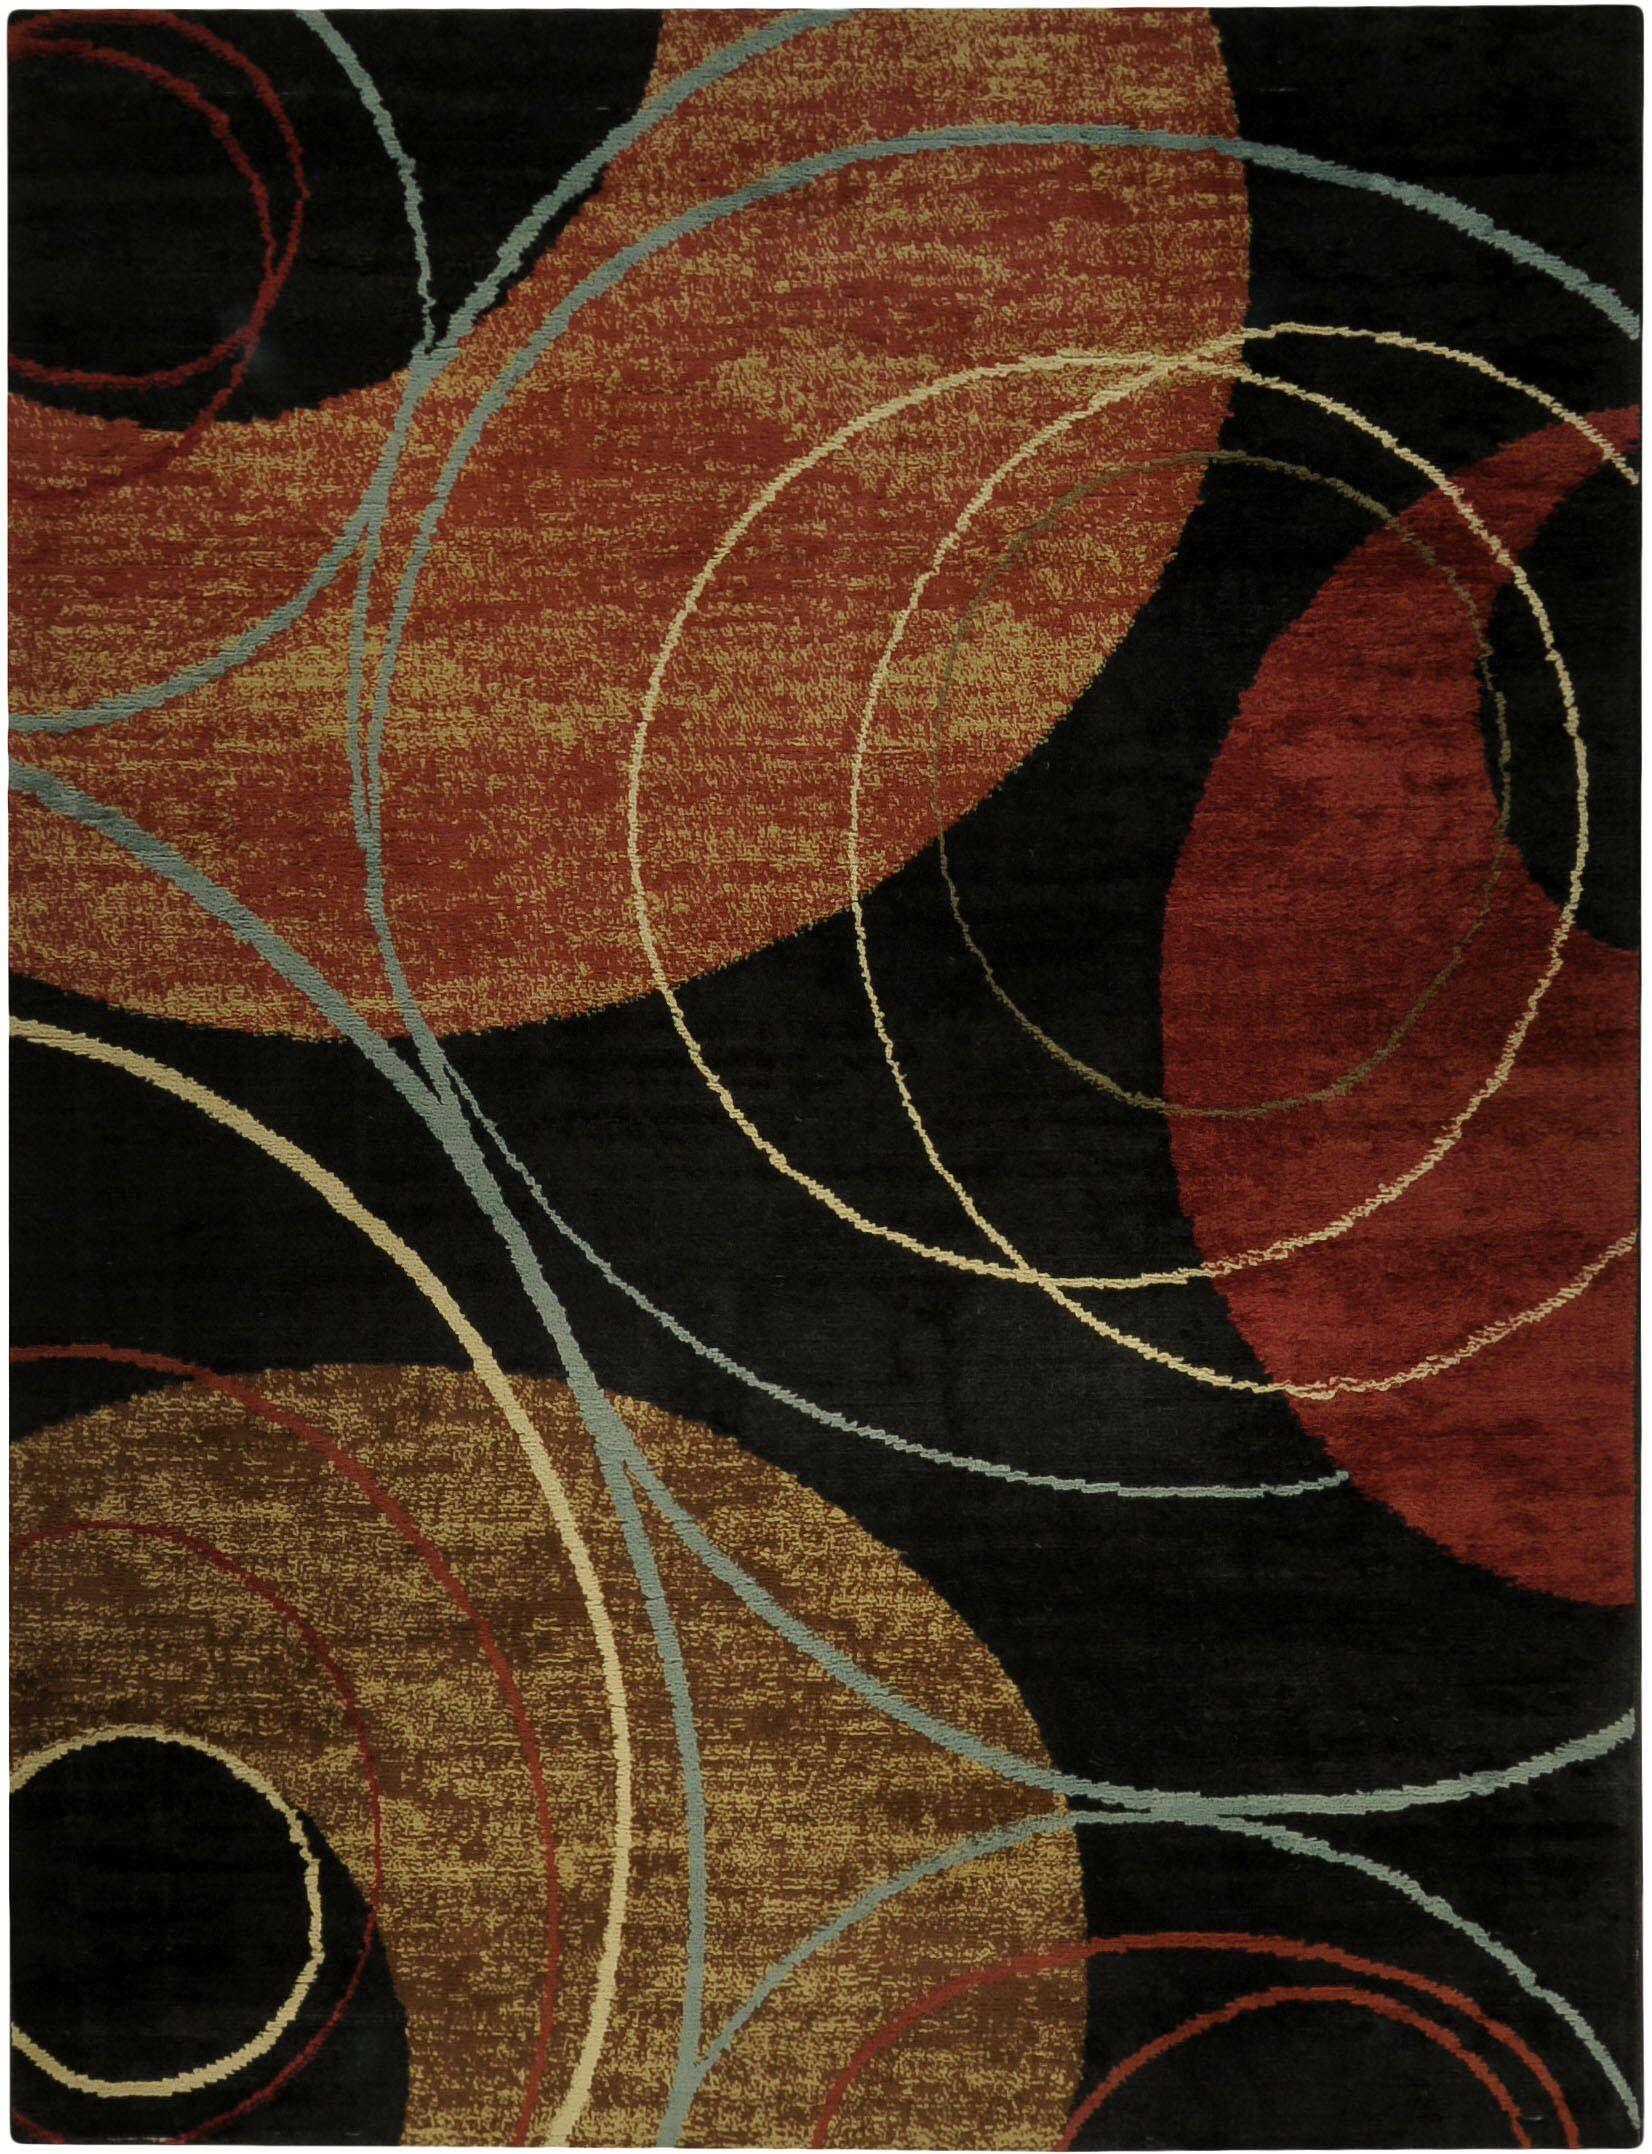 Hinson Interlock Circles Contemporary Black Area Rug Rug Size: 7'10